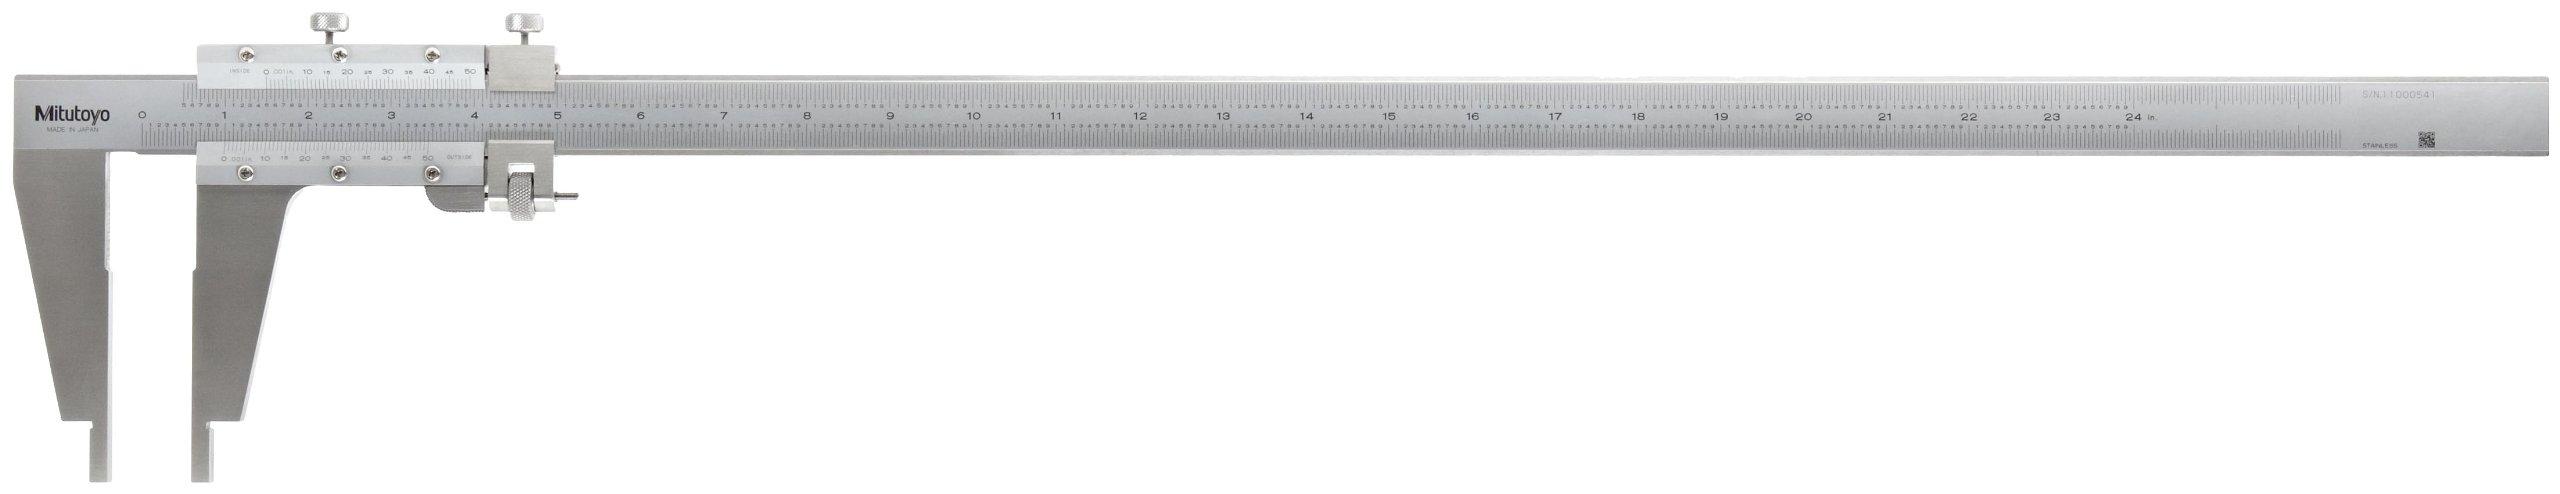 Mitutoyo 160-102 Vernier Caliper, Stainless Steel, Nib Style Jaw, 0-24'' Range, +/-0.002'' Accuracy, 0.001'' Resolution by Mitutoyo